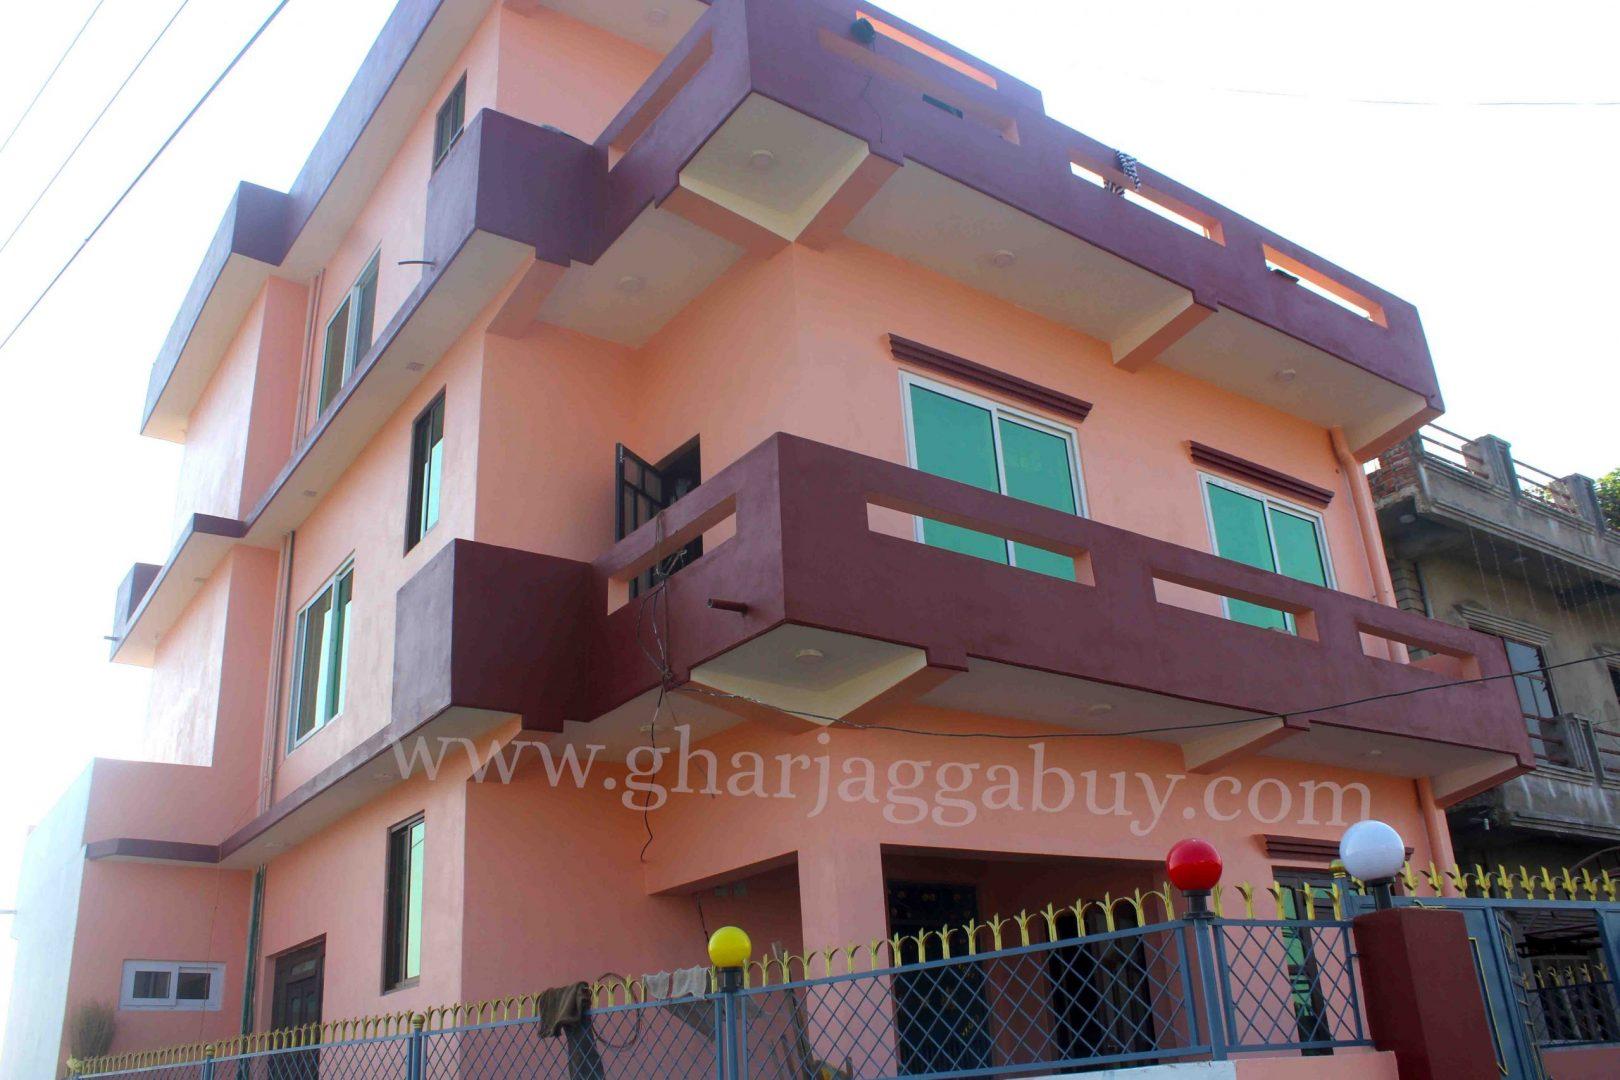 A beautiful house for sale in Manigram, Tilottama-5, Rupandehi Nepal